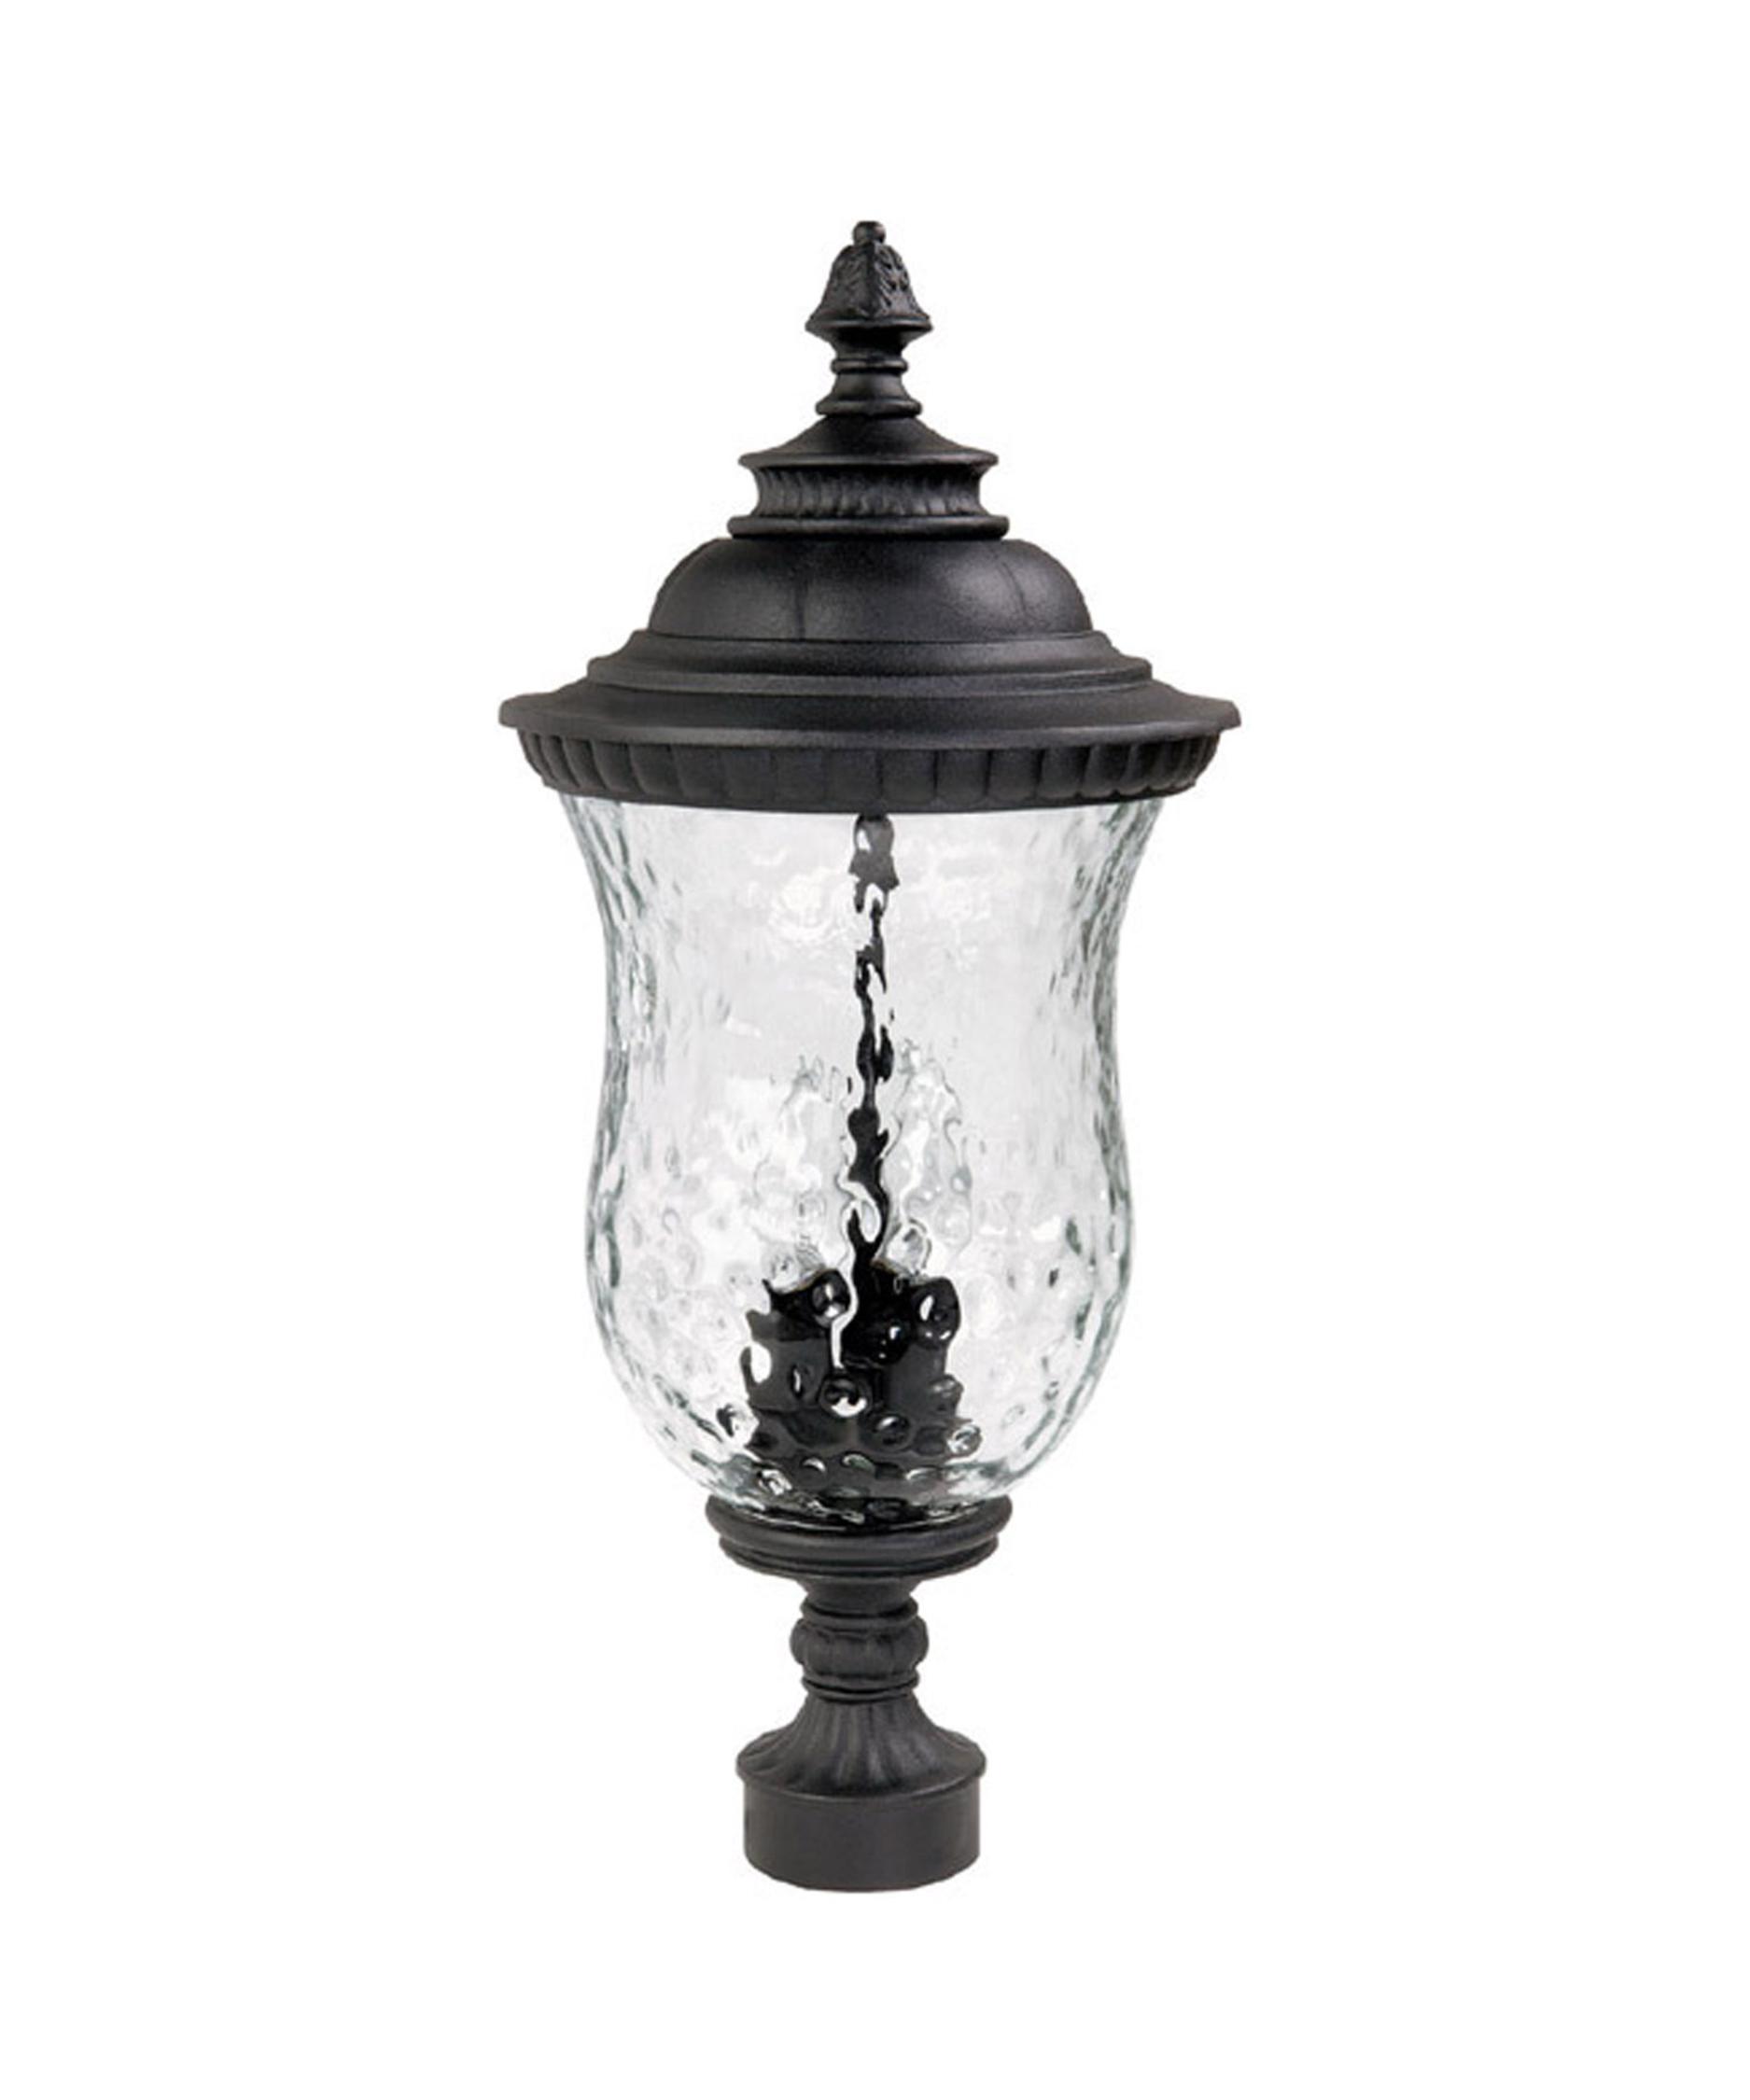 Capital Lighting 9785 Ashford 10 Inch Wide 3 Light Outdoor Post Lamp    Capitol Lighting 1 800lighting.com